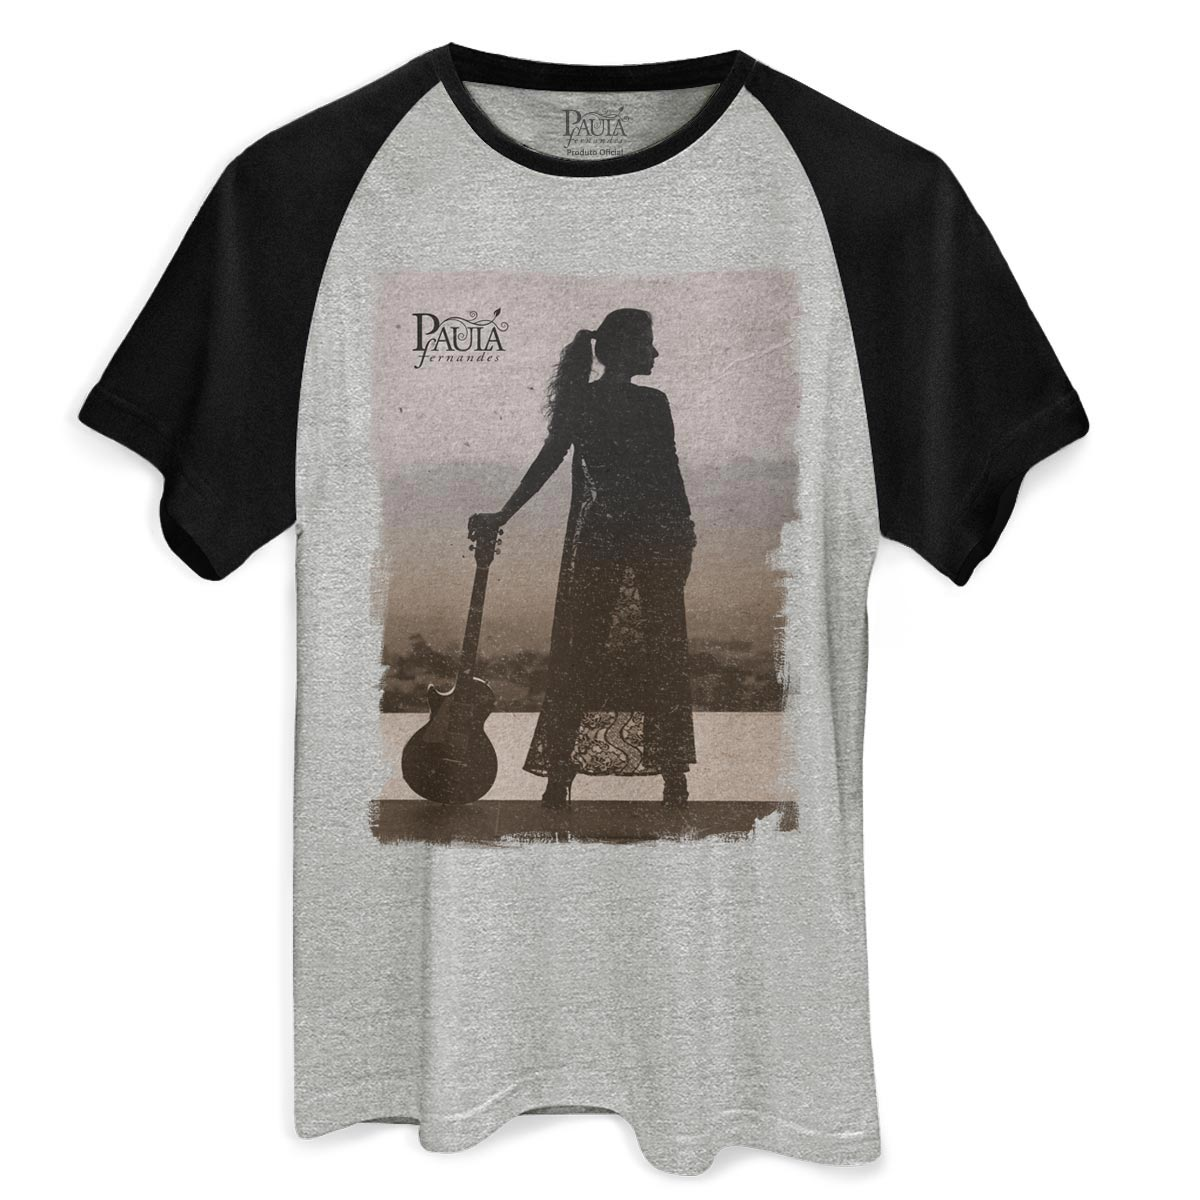 Camiseta Raglan Masculina Paula Fernandes Pronta pra Você